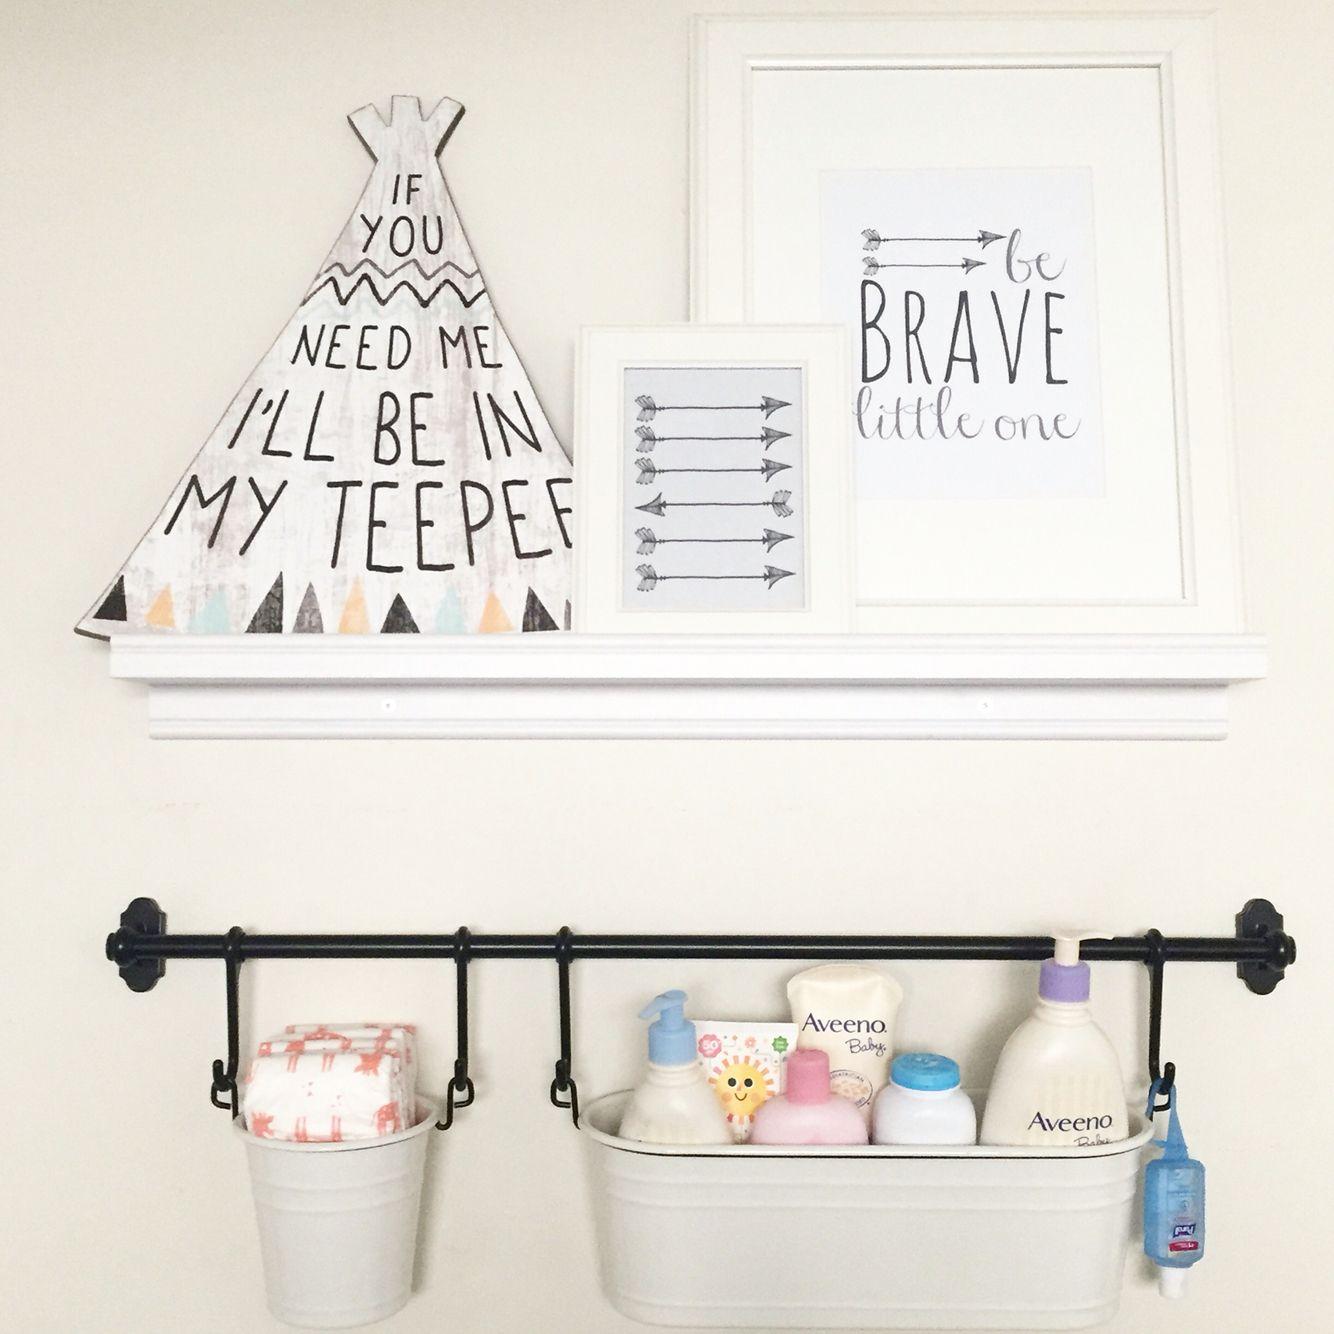 die besten 25 ikea online katalog ideen auf pinterest www ikea de onlineshop ikea sessel. Black Bedroom Furniture Sets. Home Design Ideas